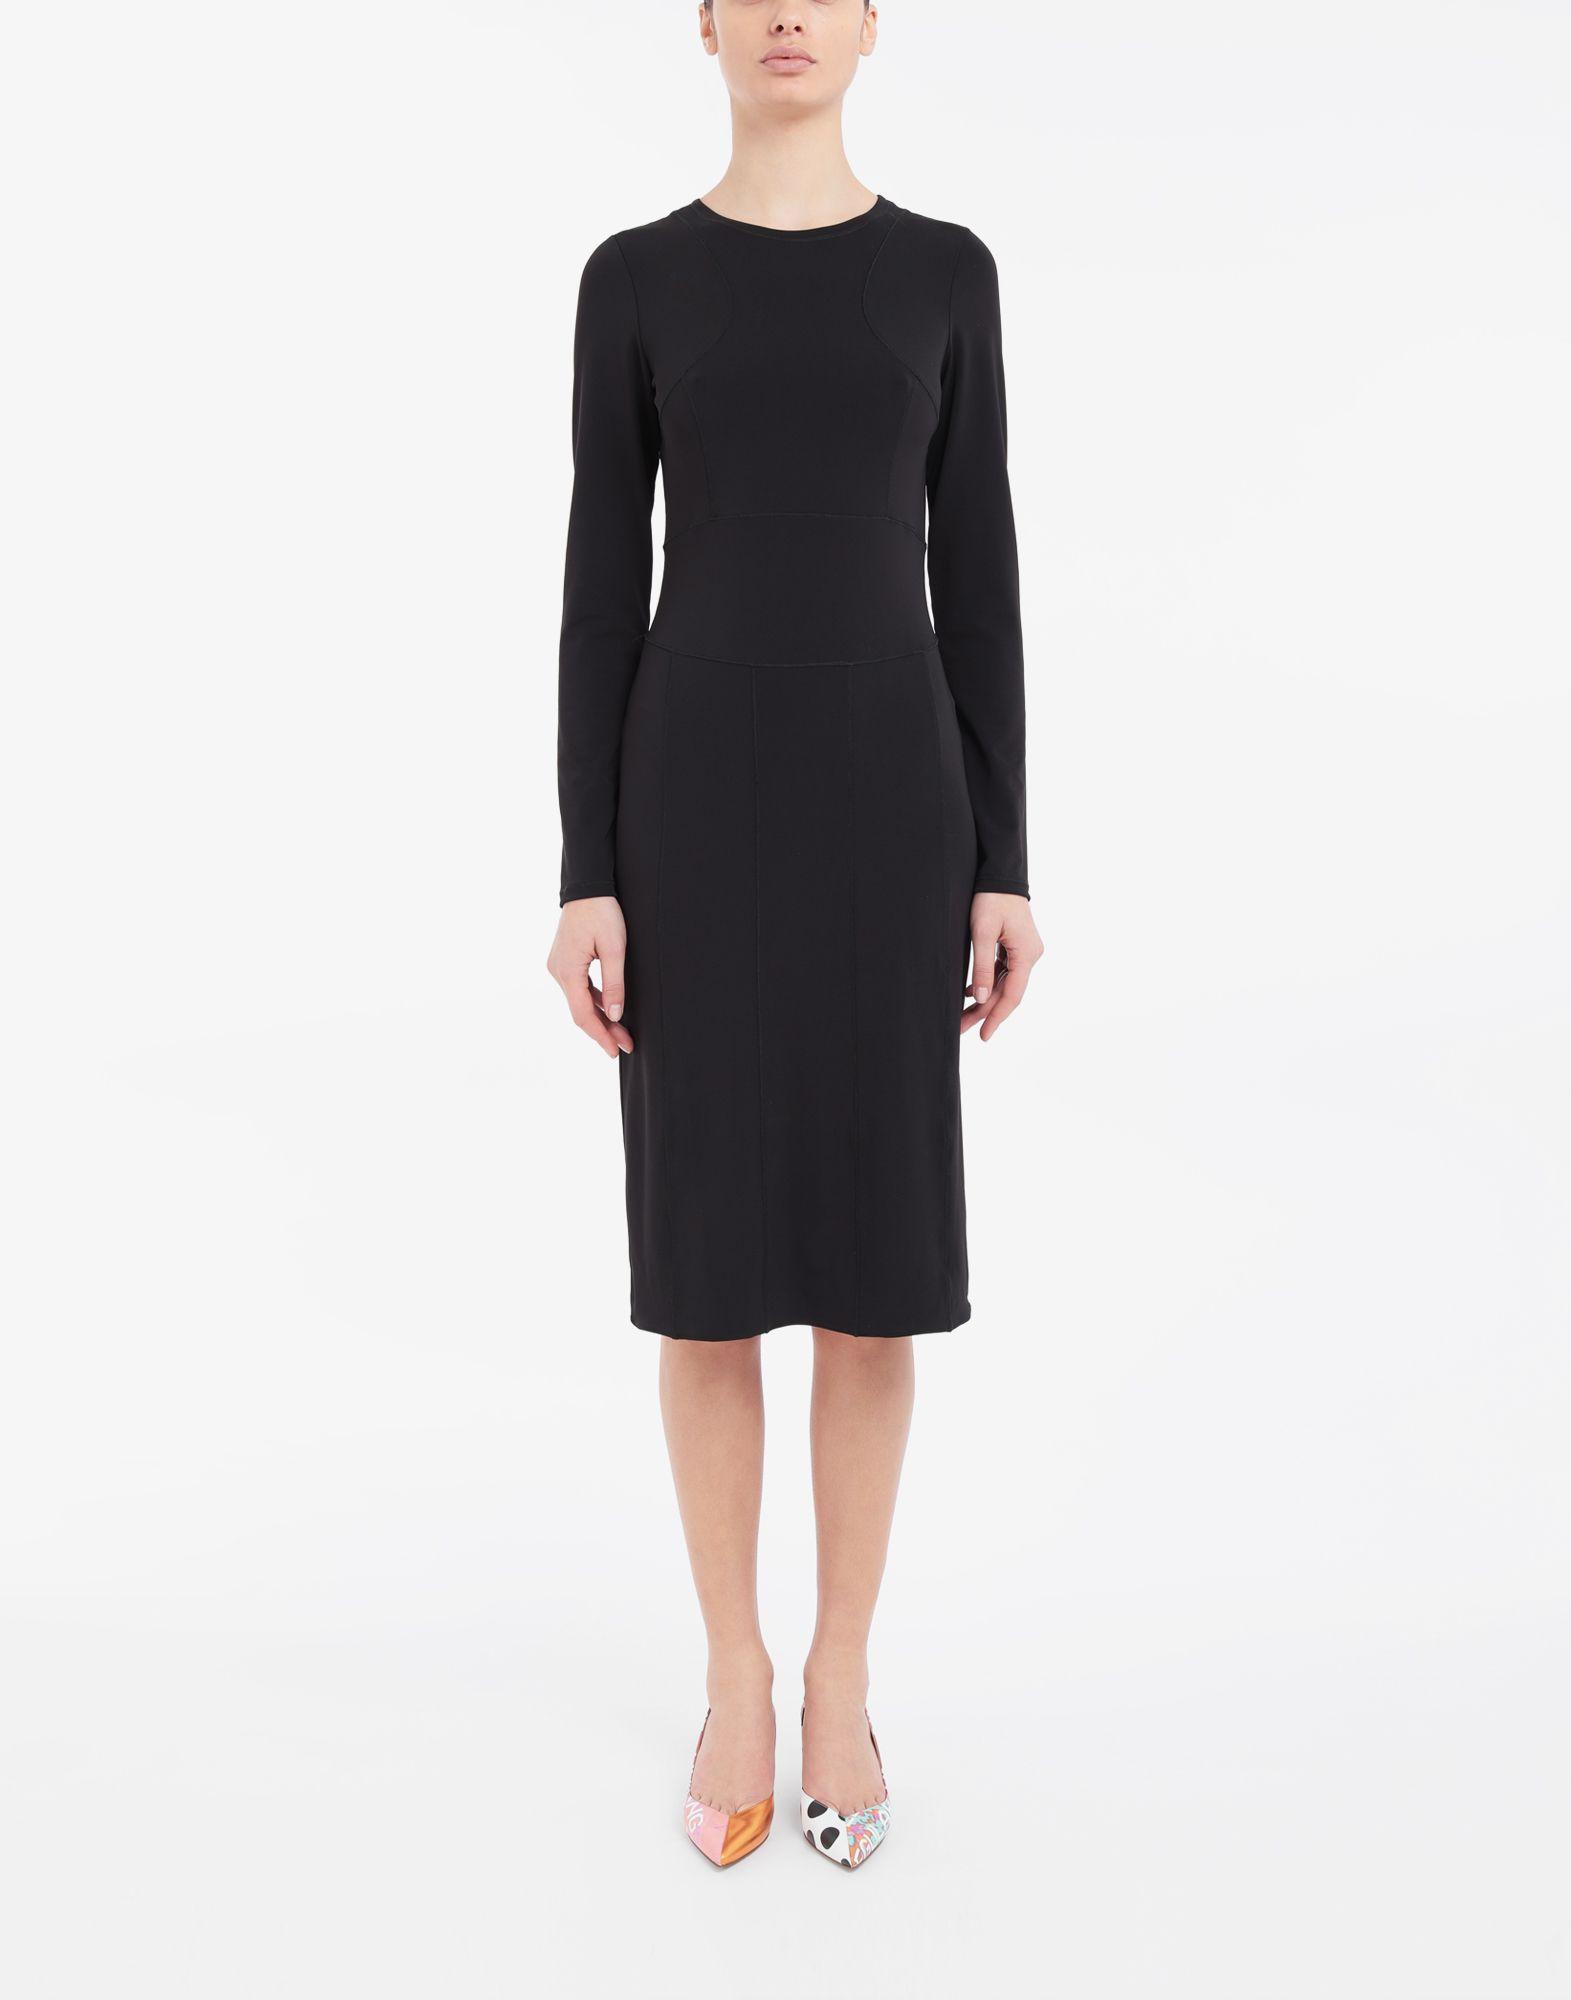 MAISON MARGIELA Stitch-jacquard jersey knit dress 3/4 length dress Woman r